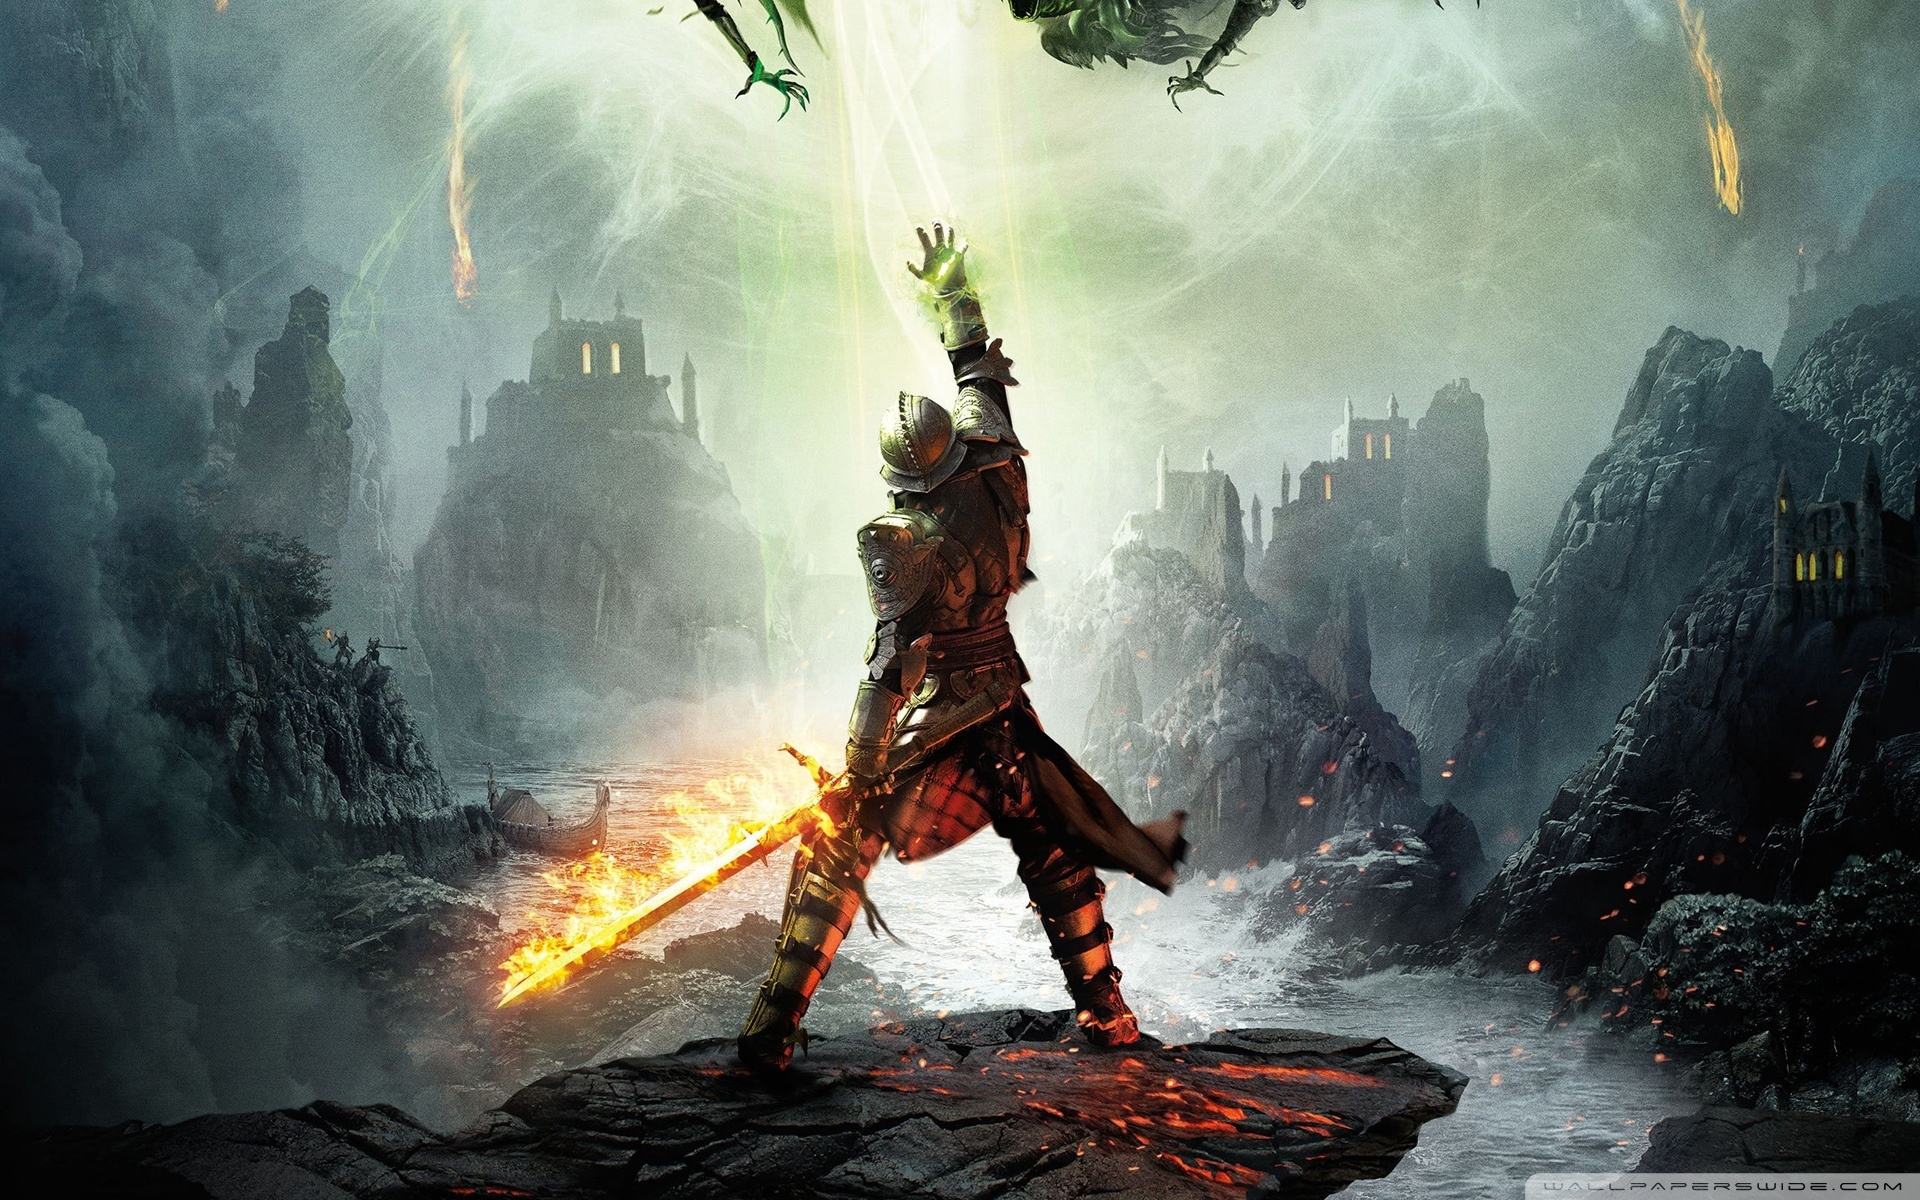 dragon age 3 inquisition ❤ 4k hd desktop wallpaper for 4k ultra hd